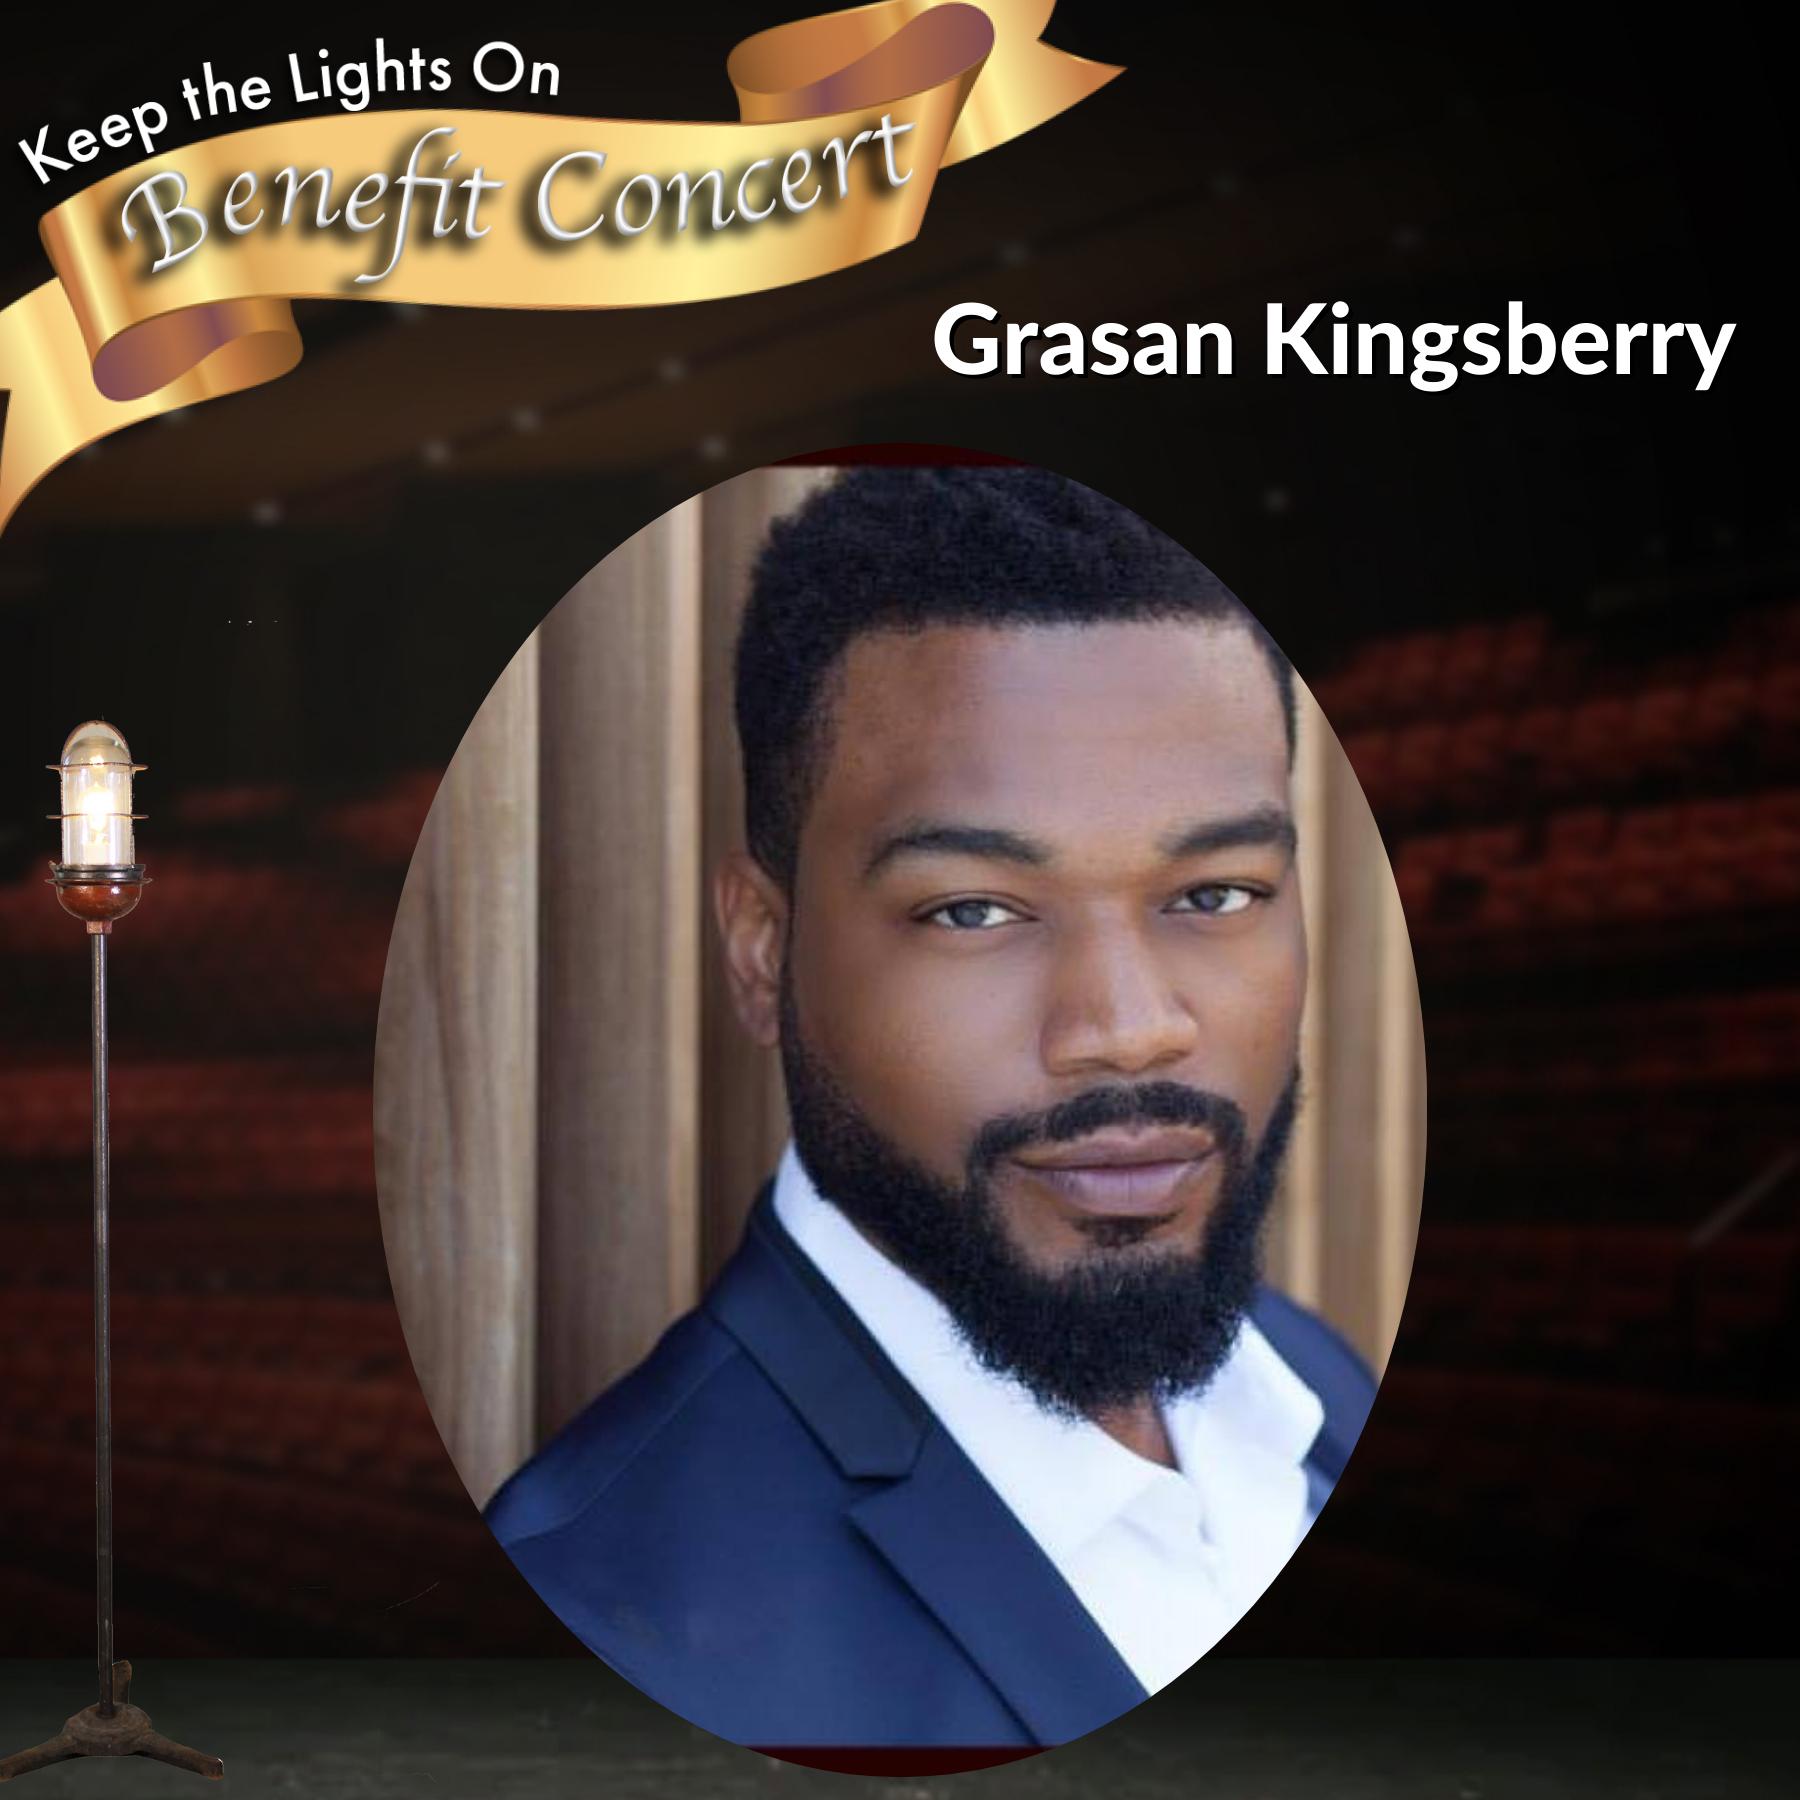 Grasan Kingsberry